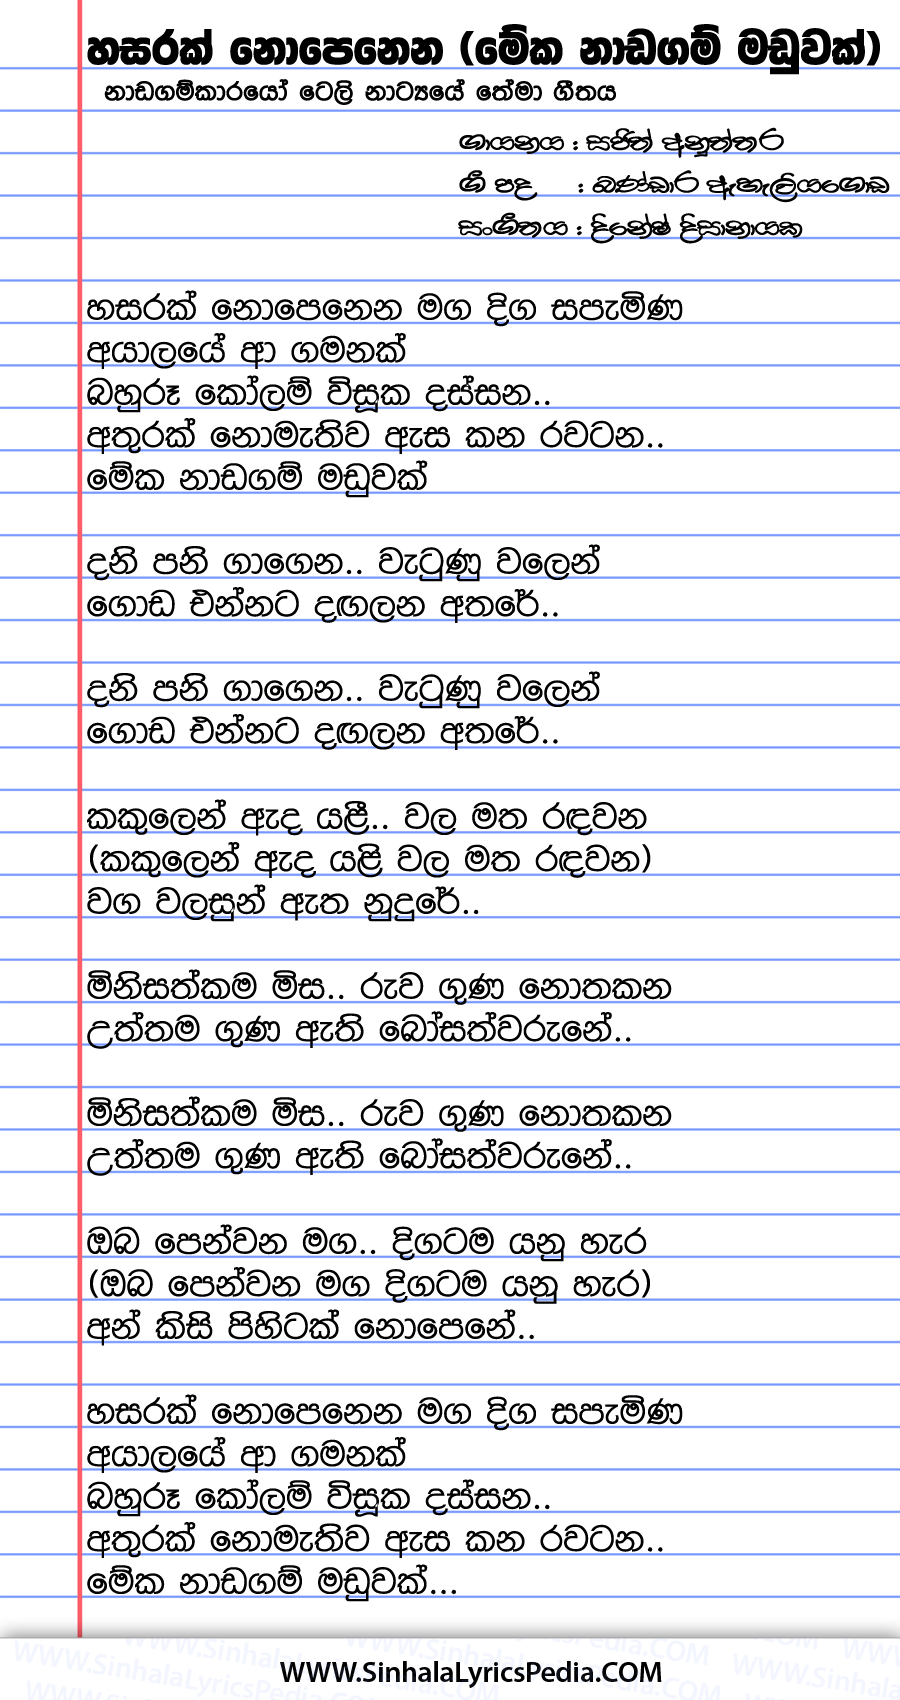 Hasarak Nopenena (Nadagamkarayo Teledrama Song) Lyrics